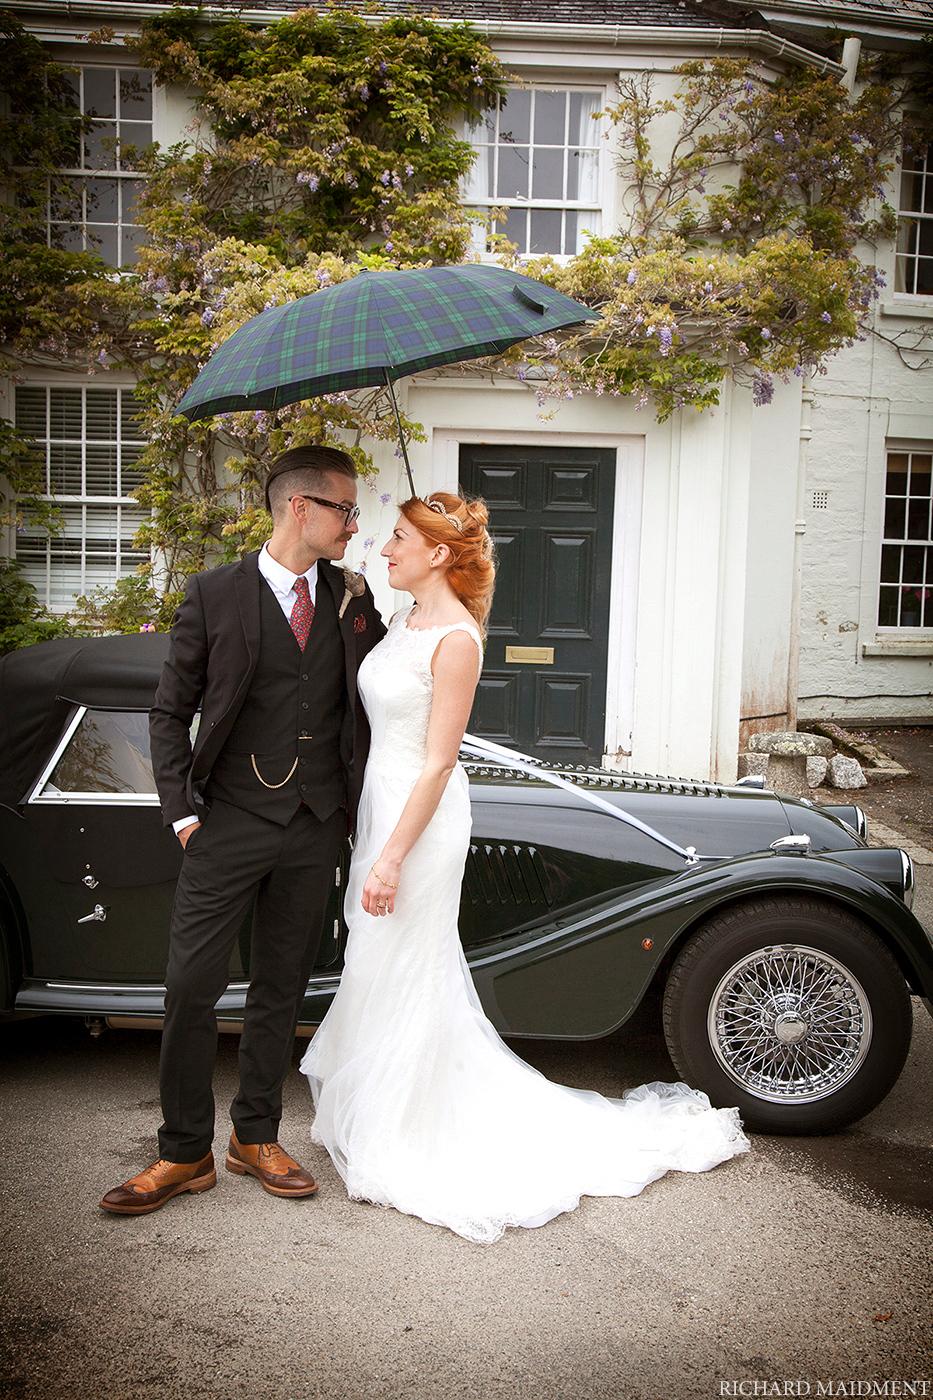 Richard Maidment - Wedding Photography (112).jpg